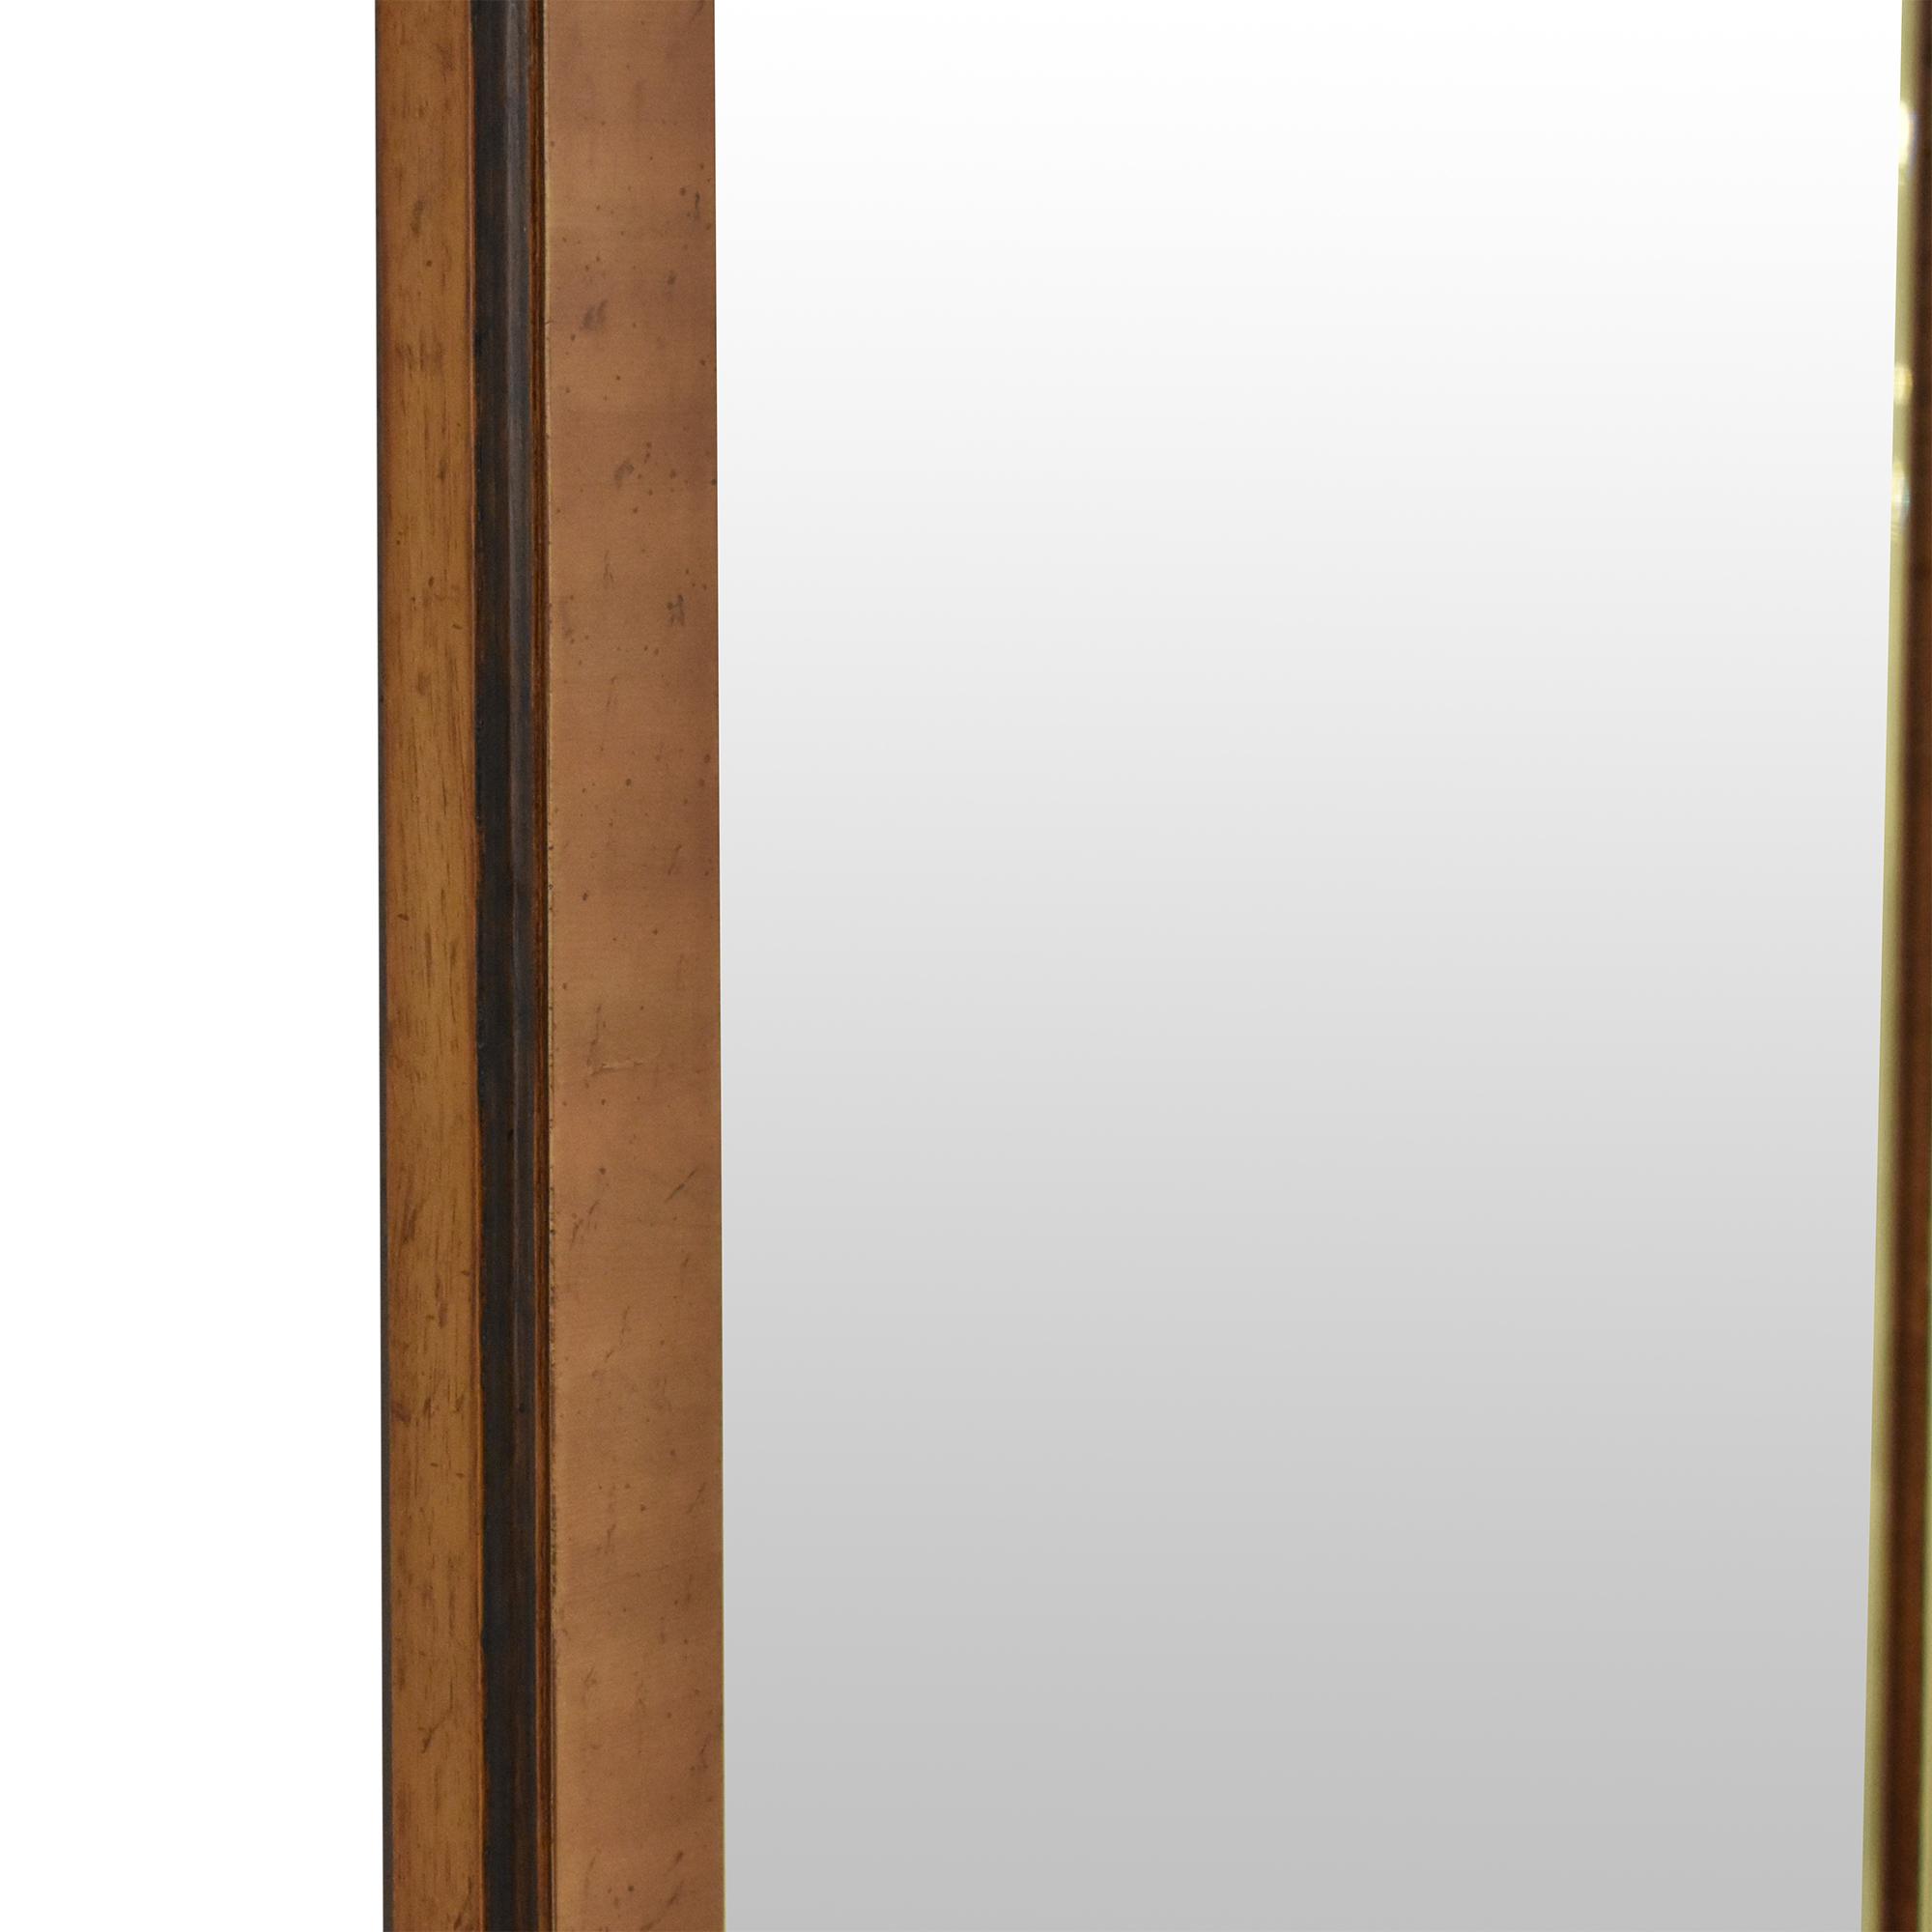 Drexel Heritage Drexel Heritage Avenues Collection Mirror ct